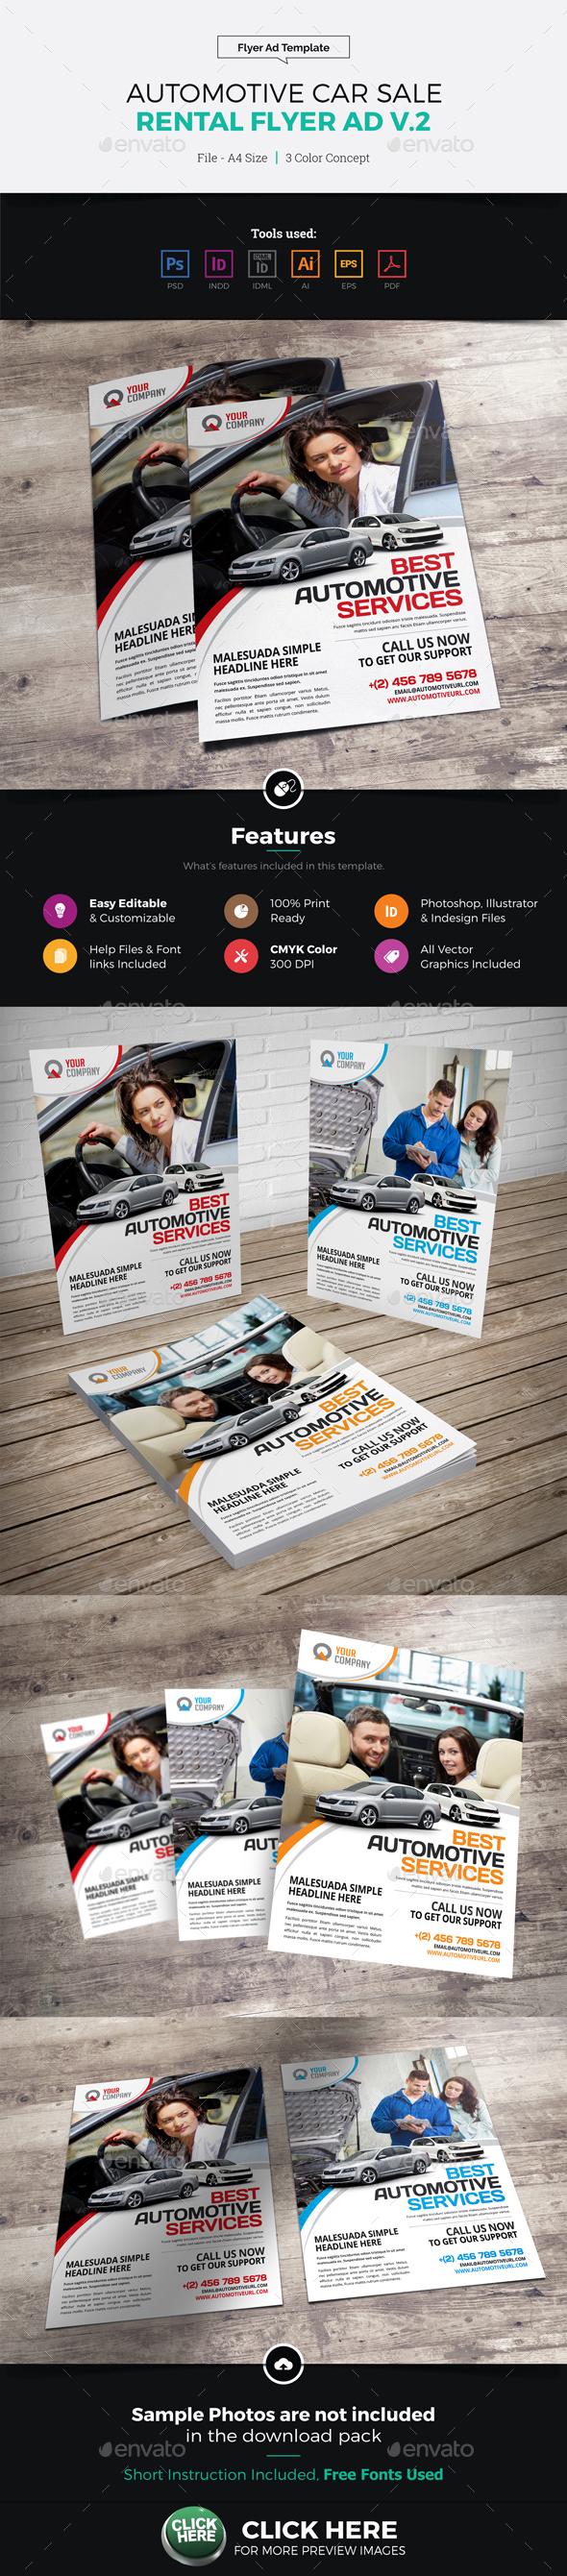 Automotive Car Sale Rental Flyer Ad v2 - Corporate Flyers